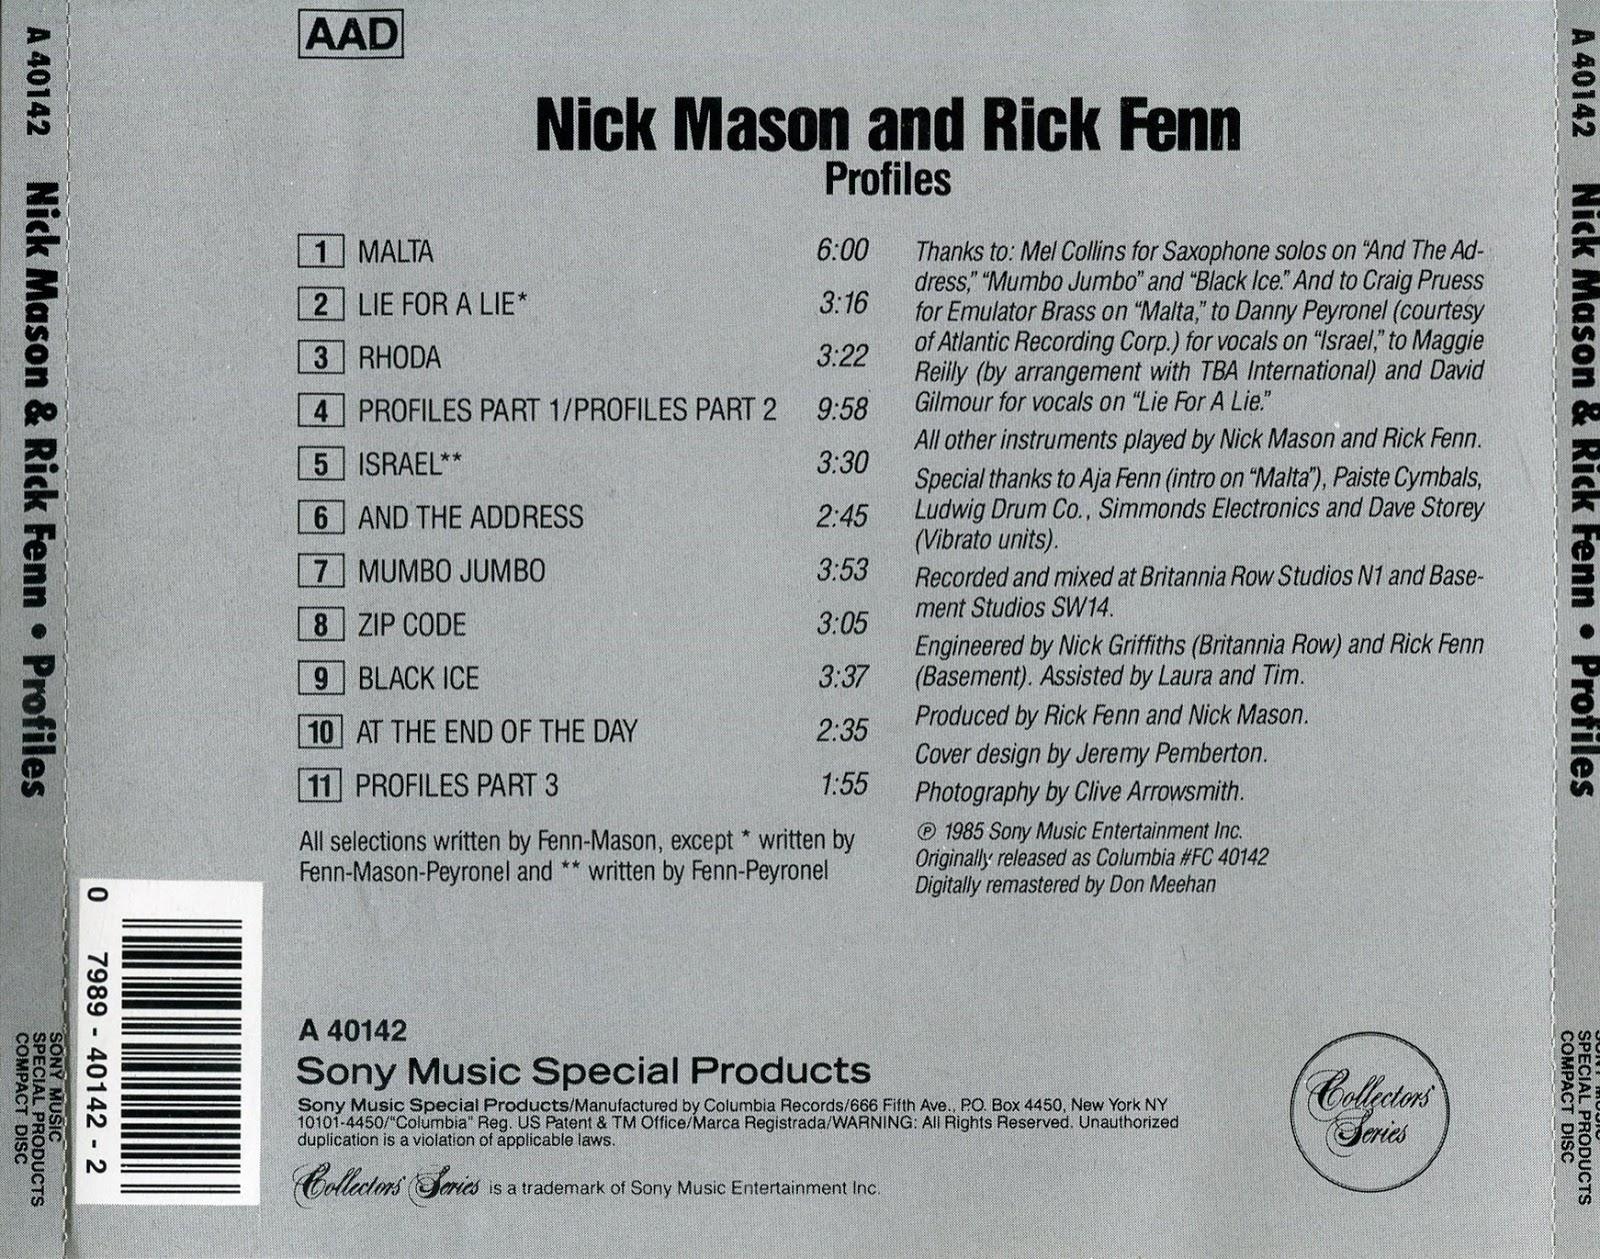 Pink Floyd Ilustrado Profiles Nick Mason Rick Fenn